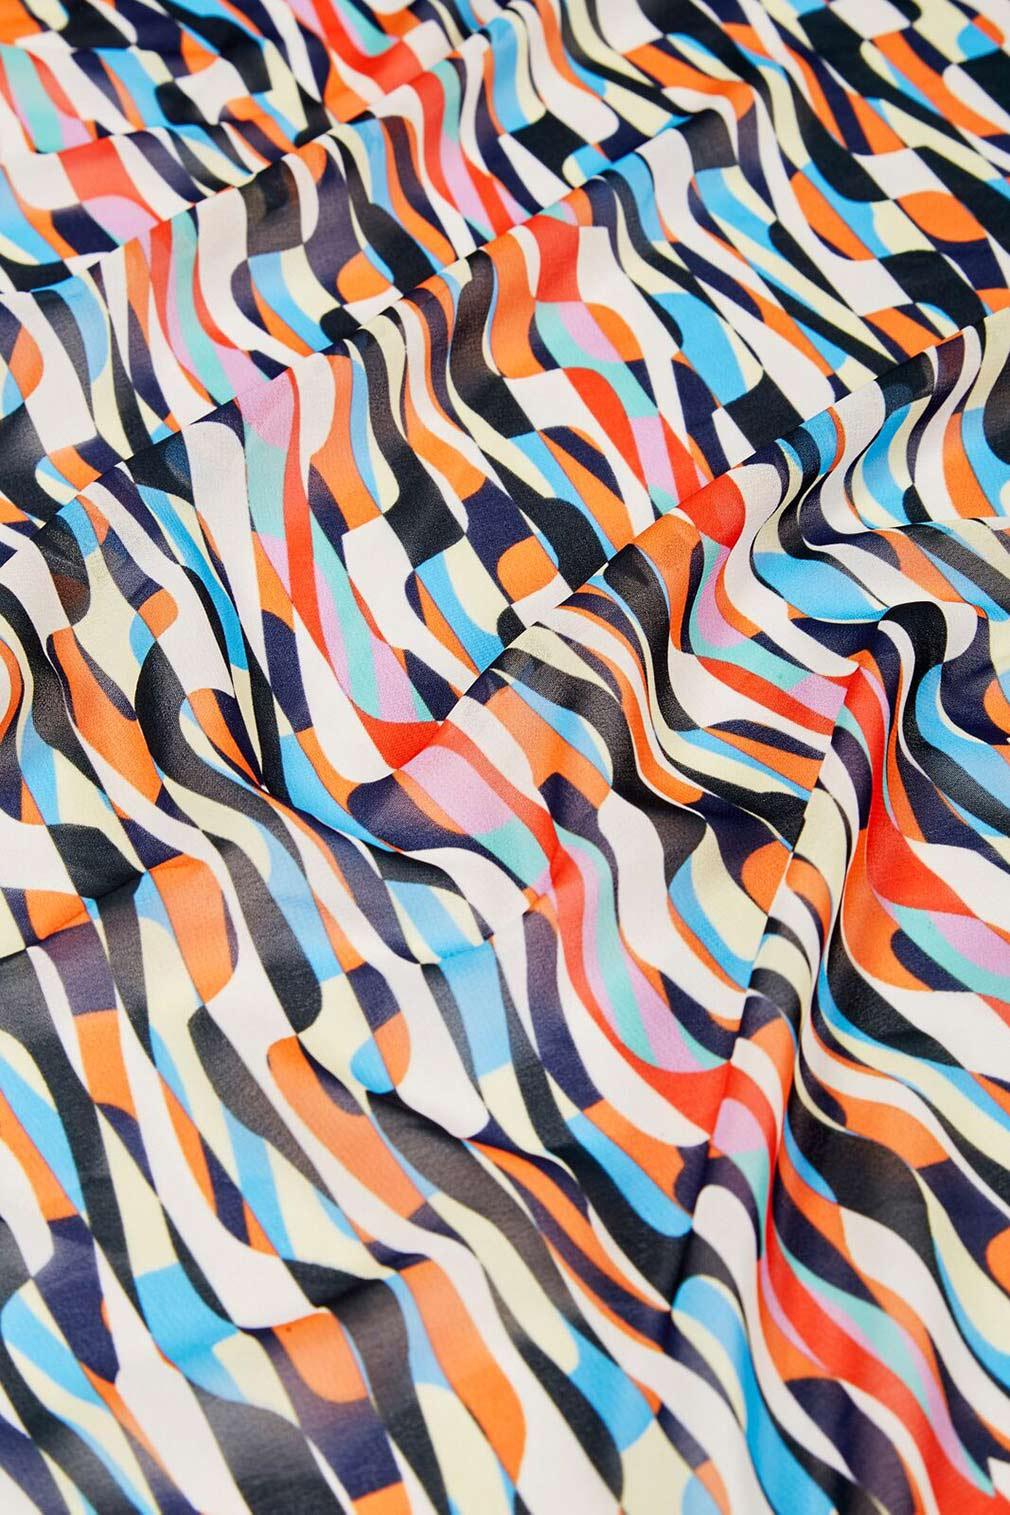 Designing A Studio For Textile Arts